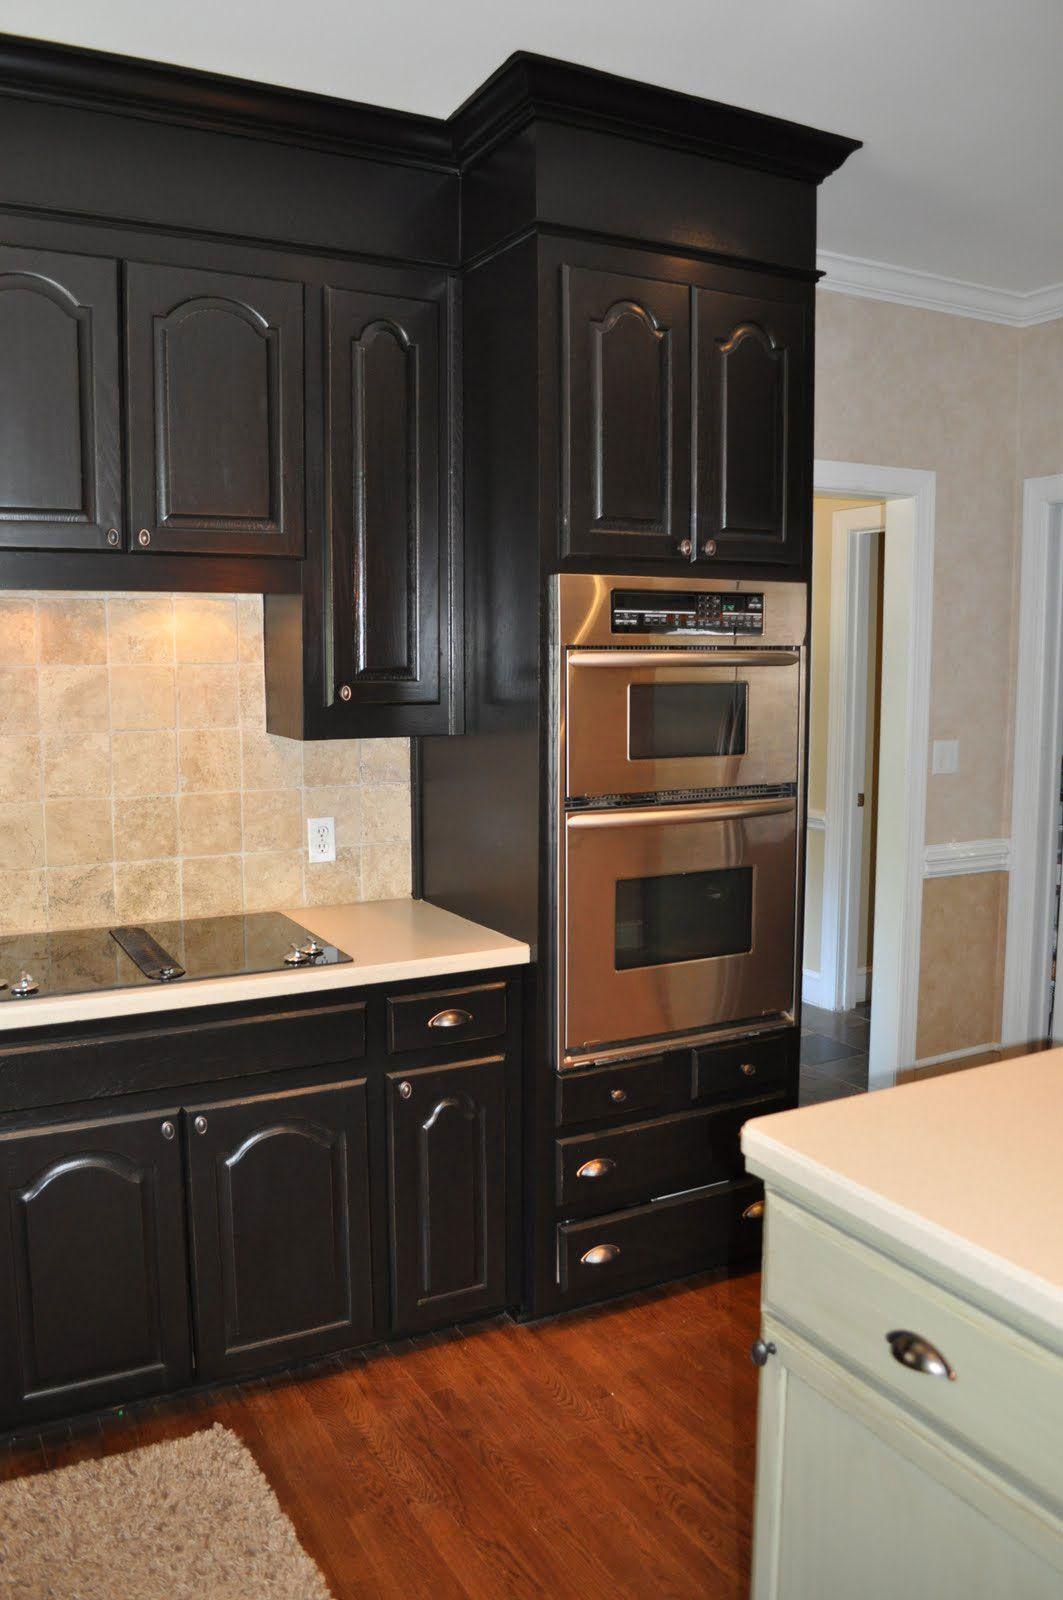 Luxurious Kitchen With Elegant Black Kitchen